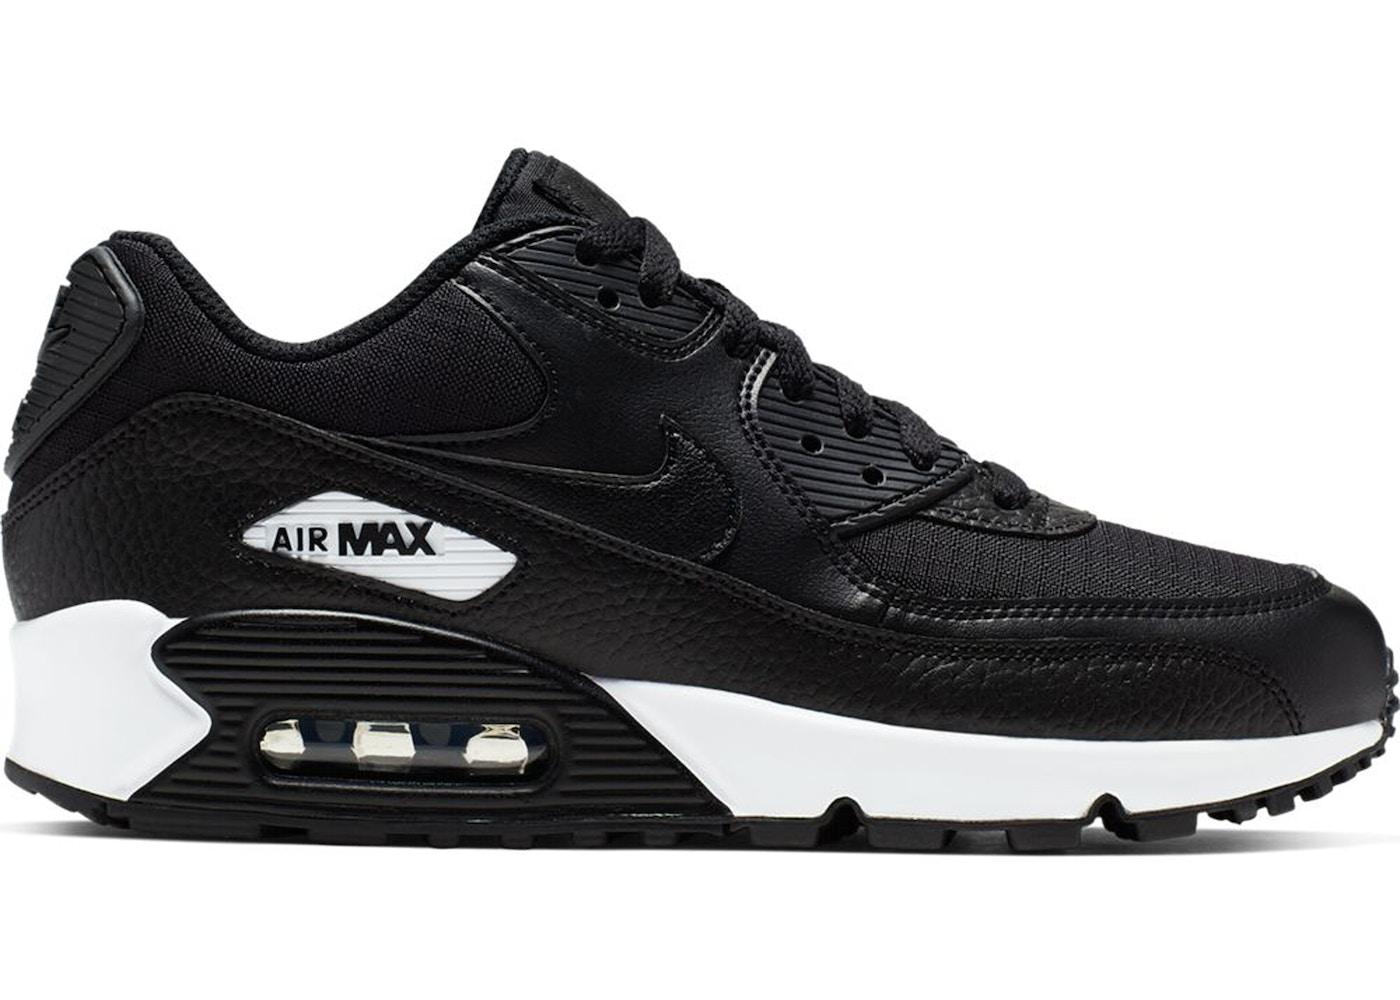 Nike Air Max 90 Black White Black (W)